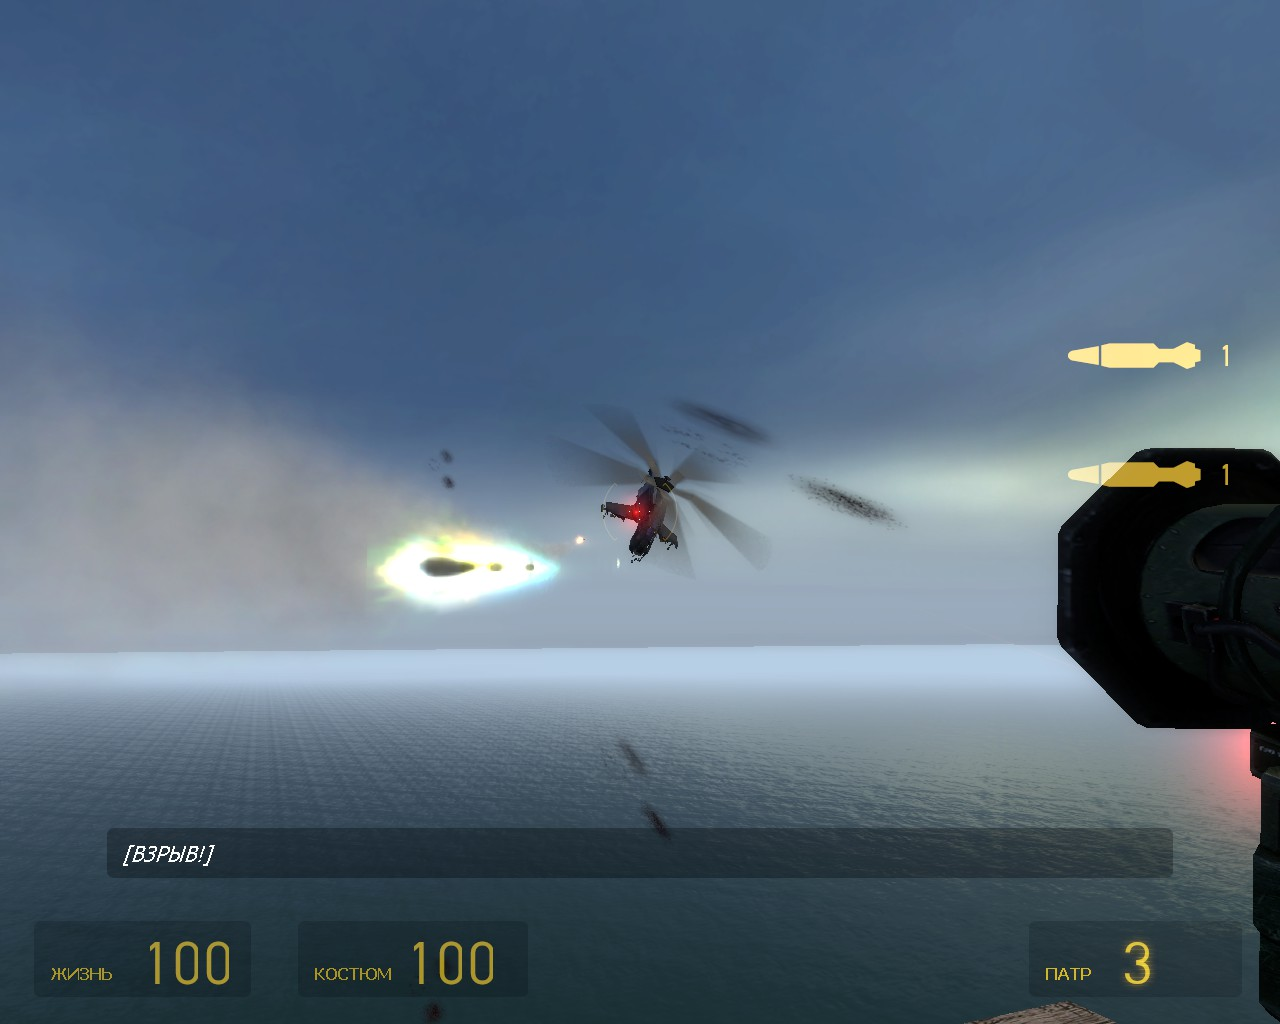 hl2 2013-11-30 23-10-46-51.jpg - Half-Life 2